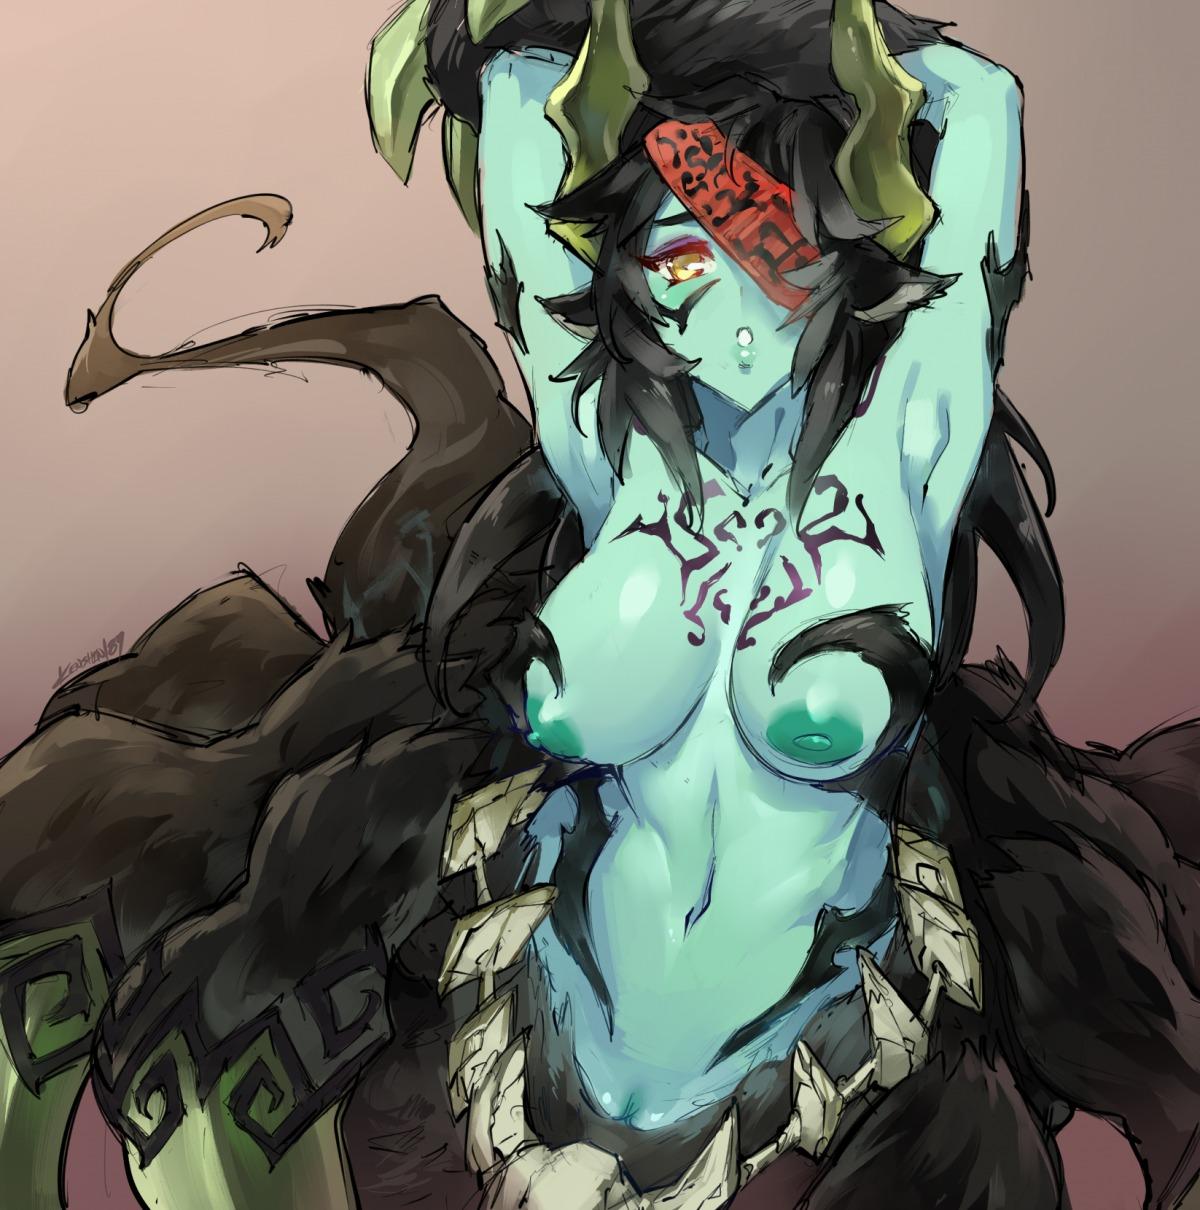 arachne monster_musume_no_iru_nichijou ushi-oni_(monster_girl_encyclopedia)